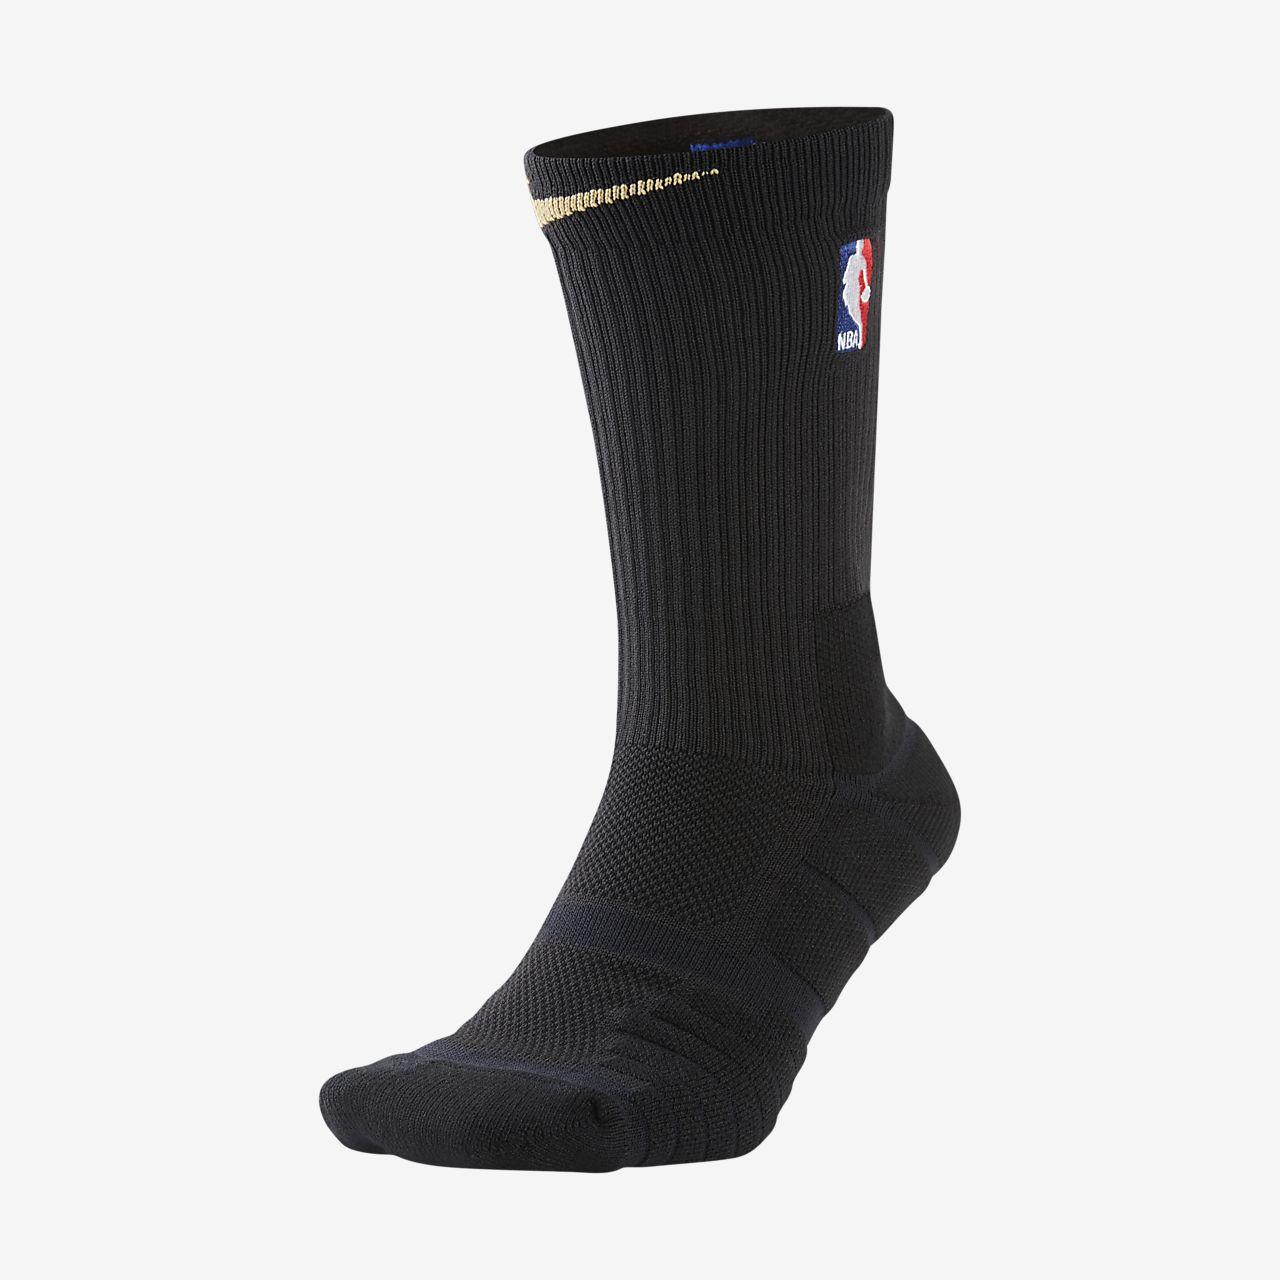 elite-quick-finals-nba-crew-socks-SwfMfd